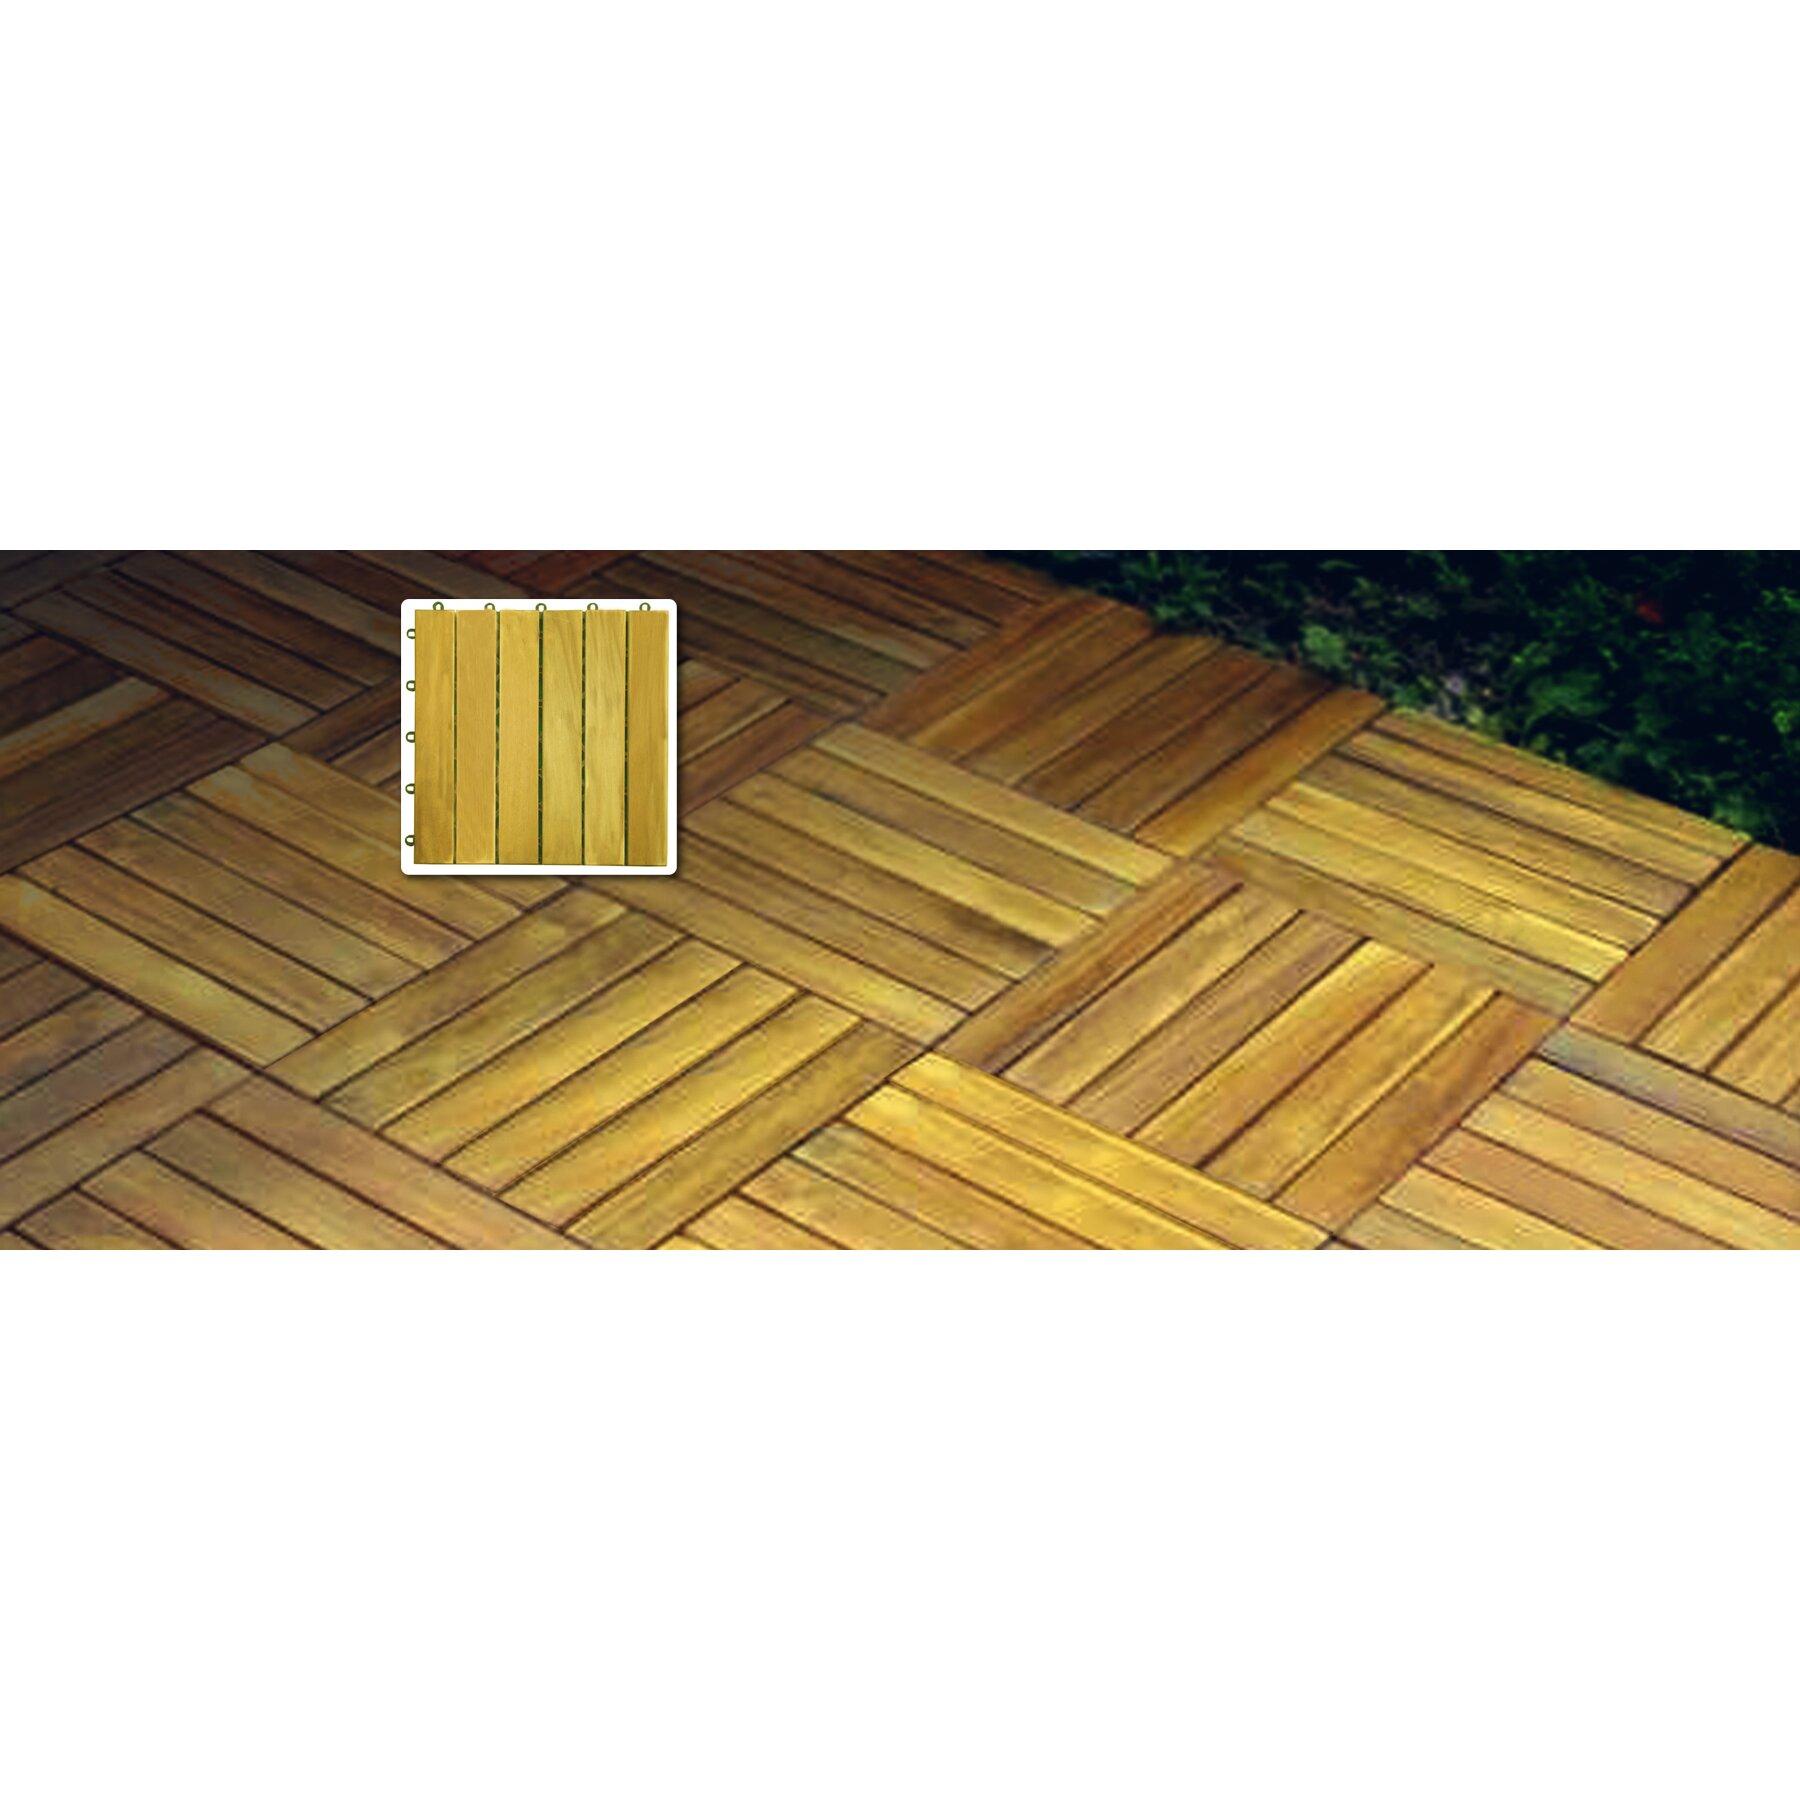 Vifah acacia 12 x 12 deck tiles reviews wayfair for Glass deck floor